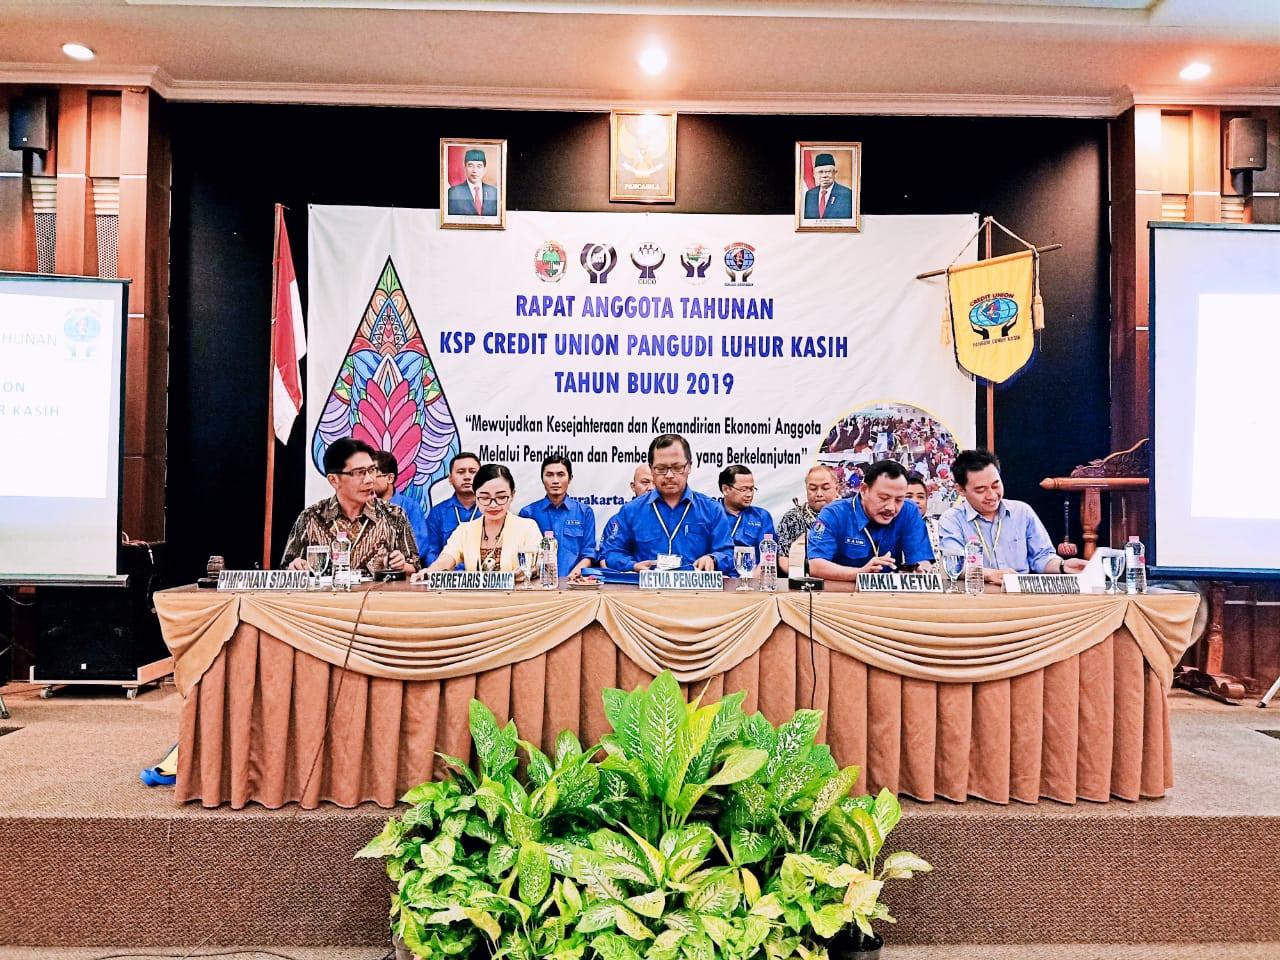 Rapat Anggota  Tahunan KSP CU PL Kasih TB 2019 Surakarta 5 – 6 Maret 2020